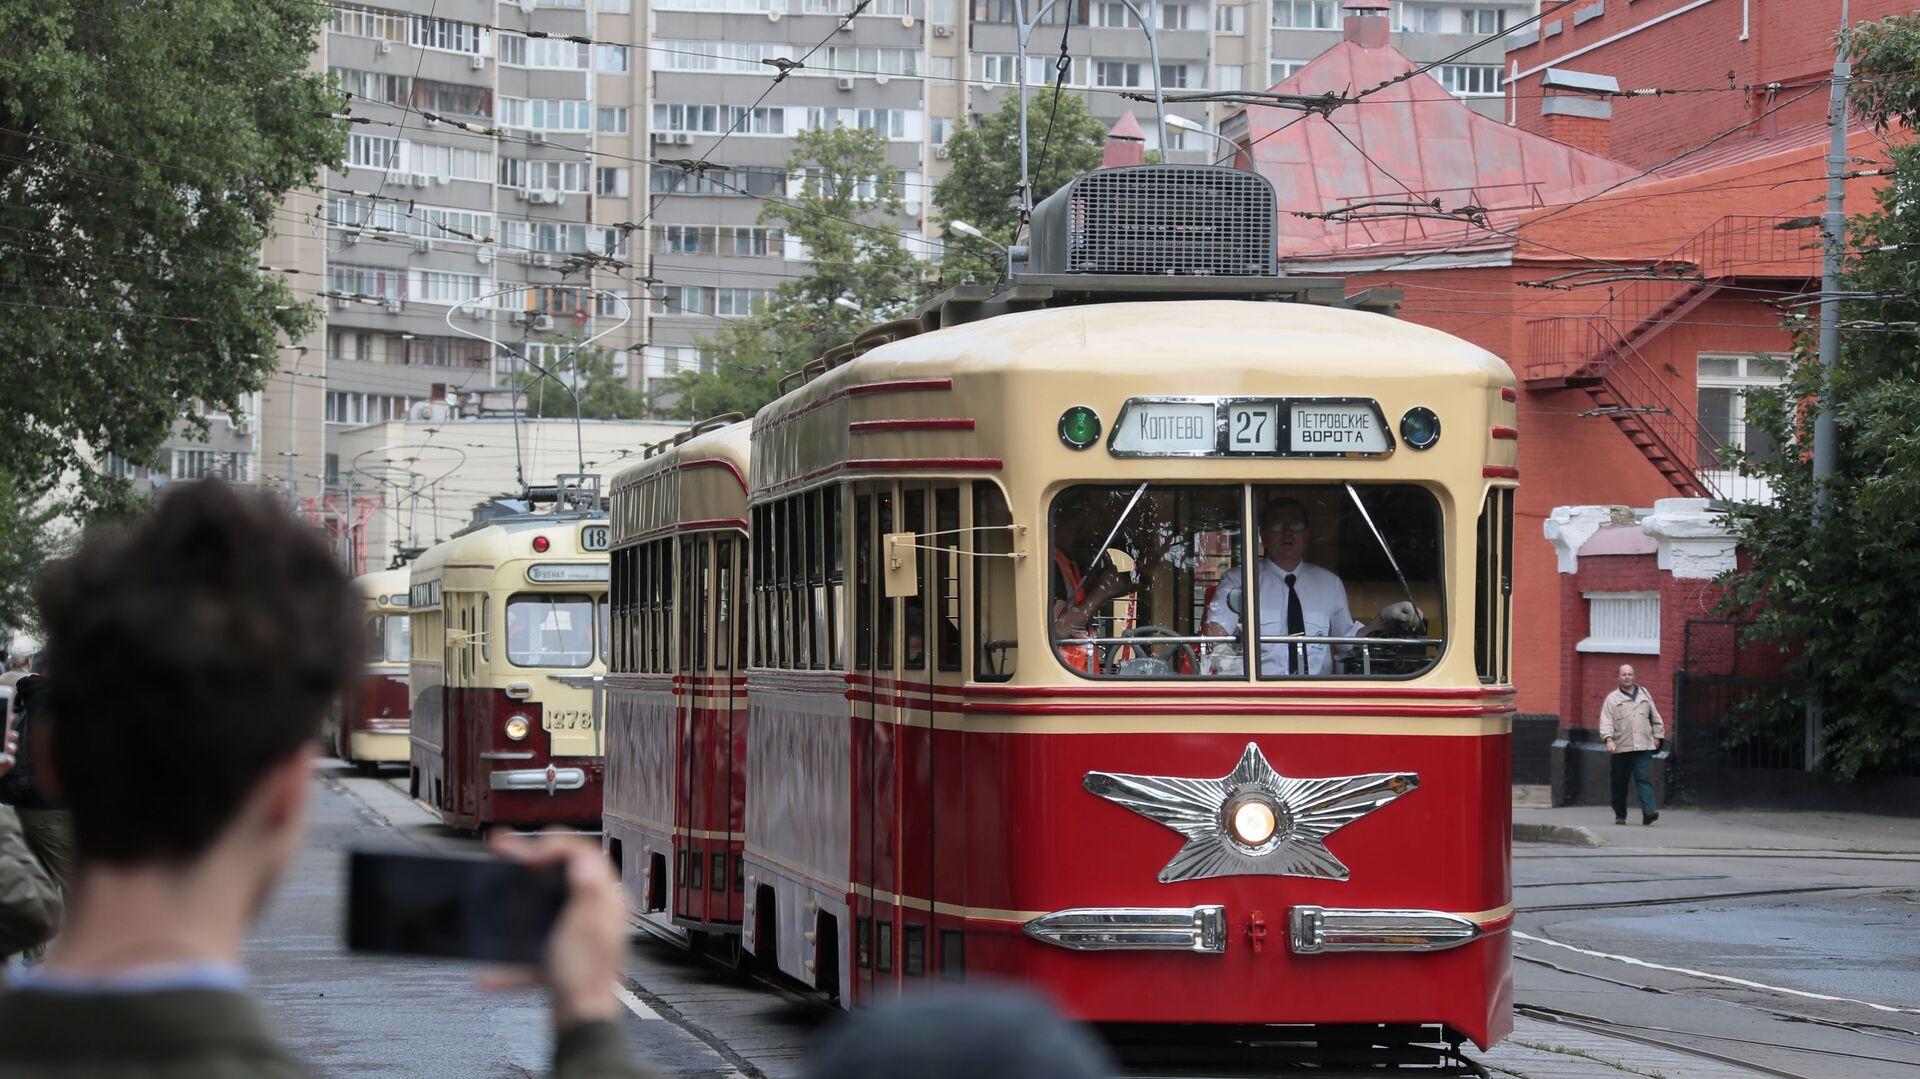 Parada tramvaja u Moskvi - Sputnik Srbija, 1920, 07.10.2021